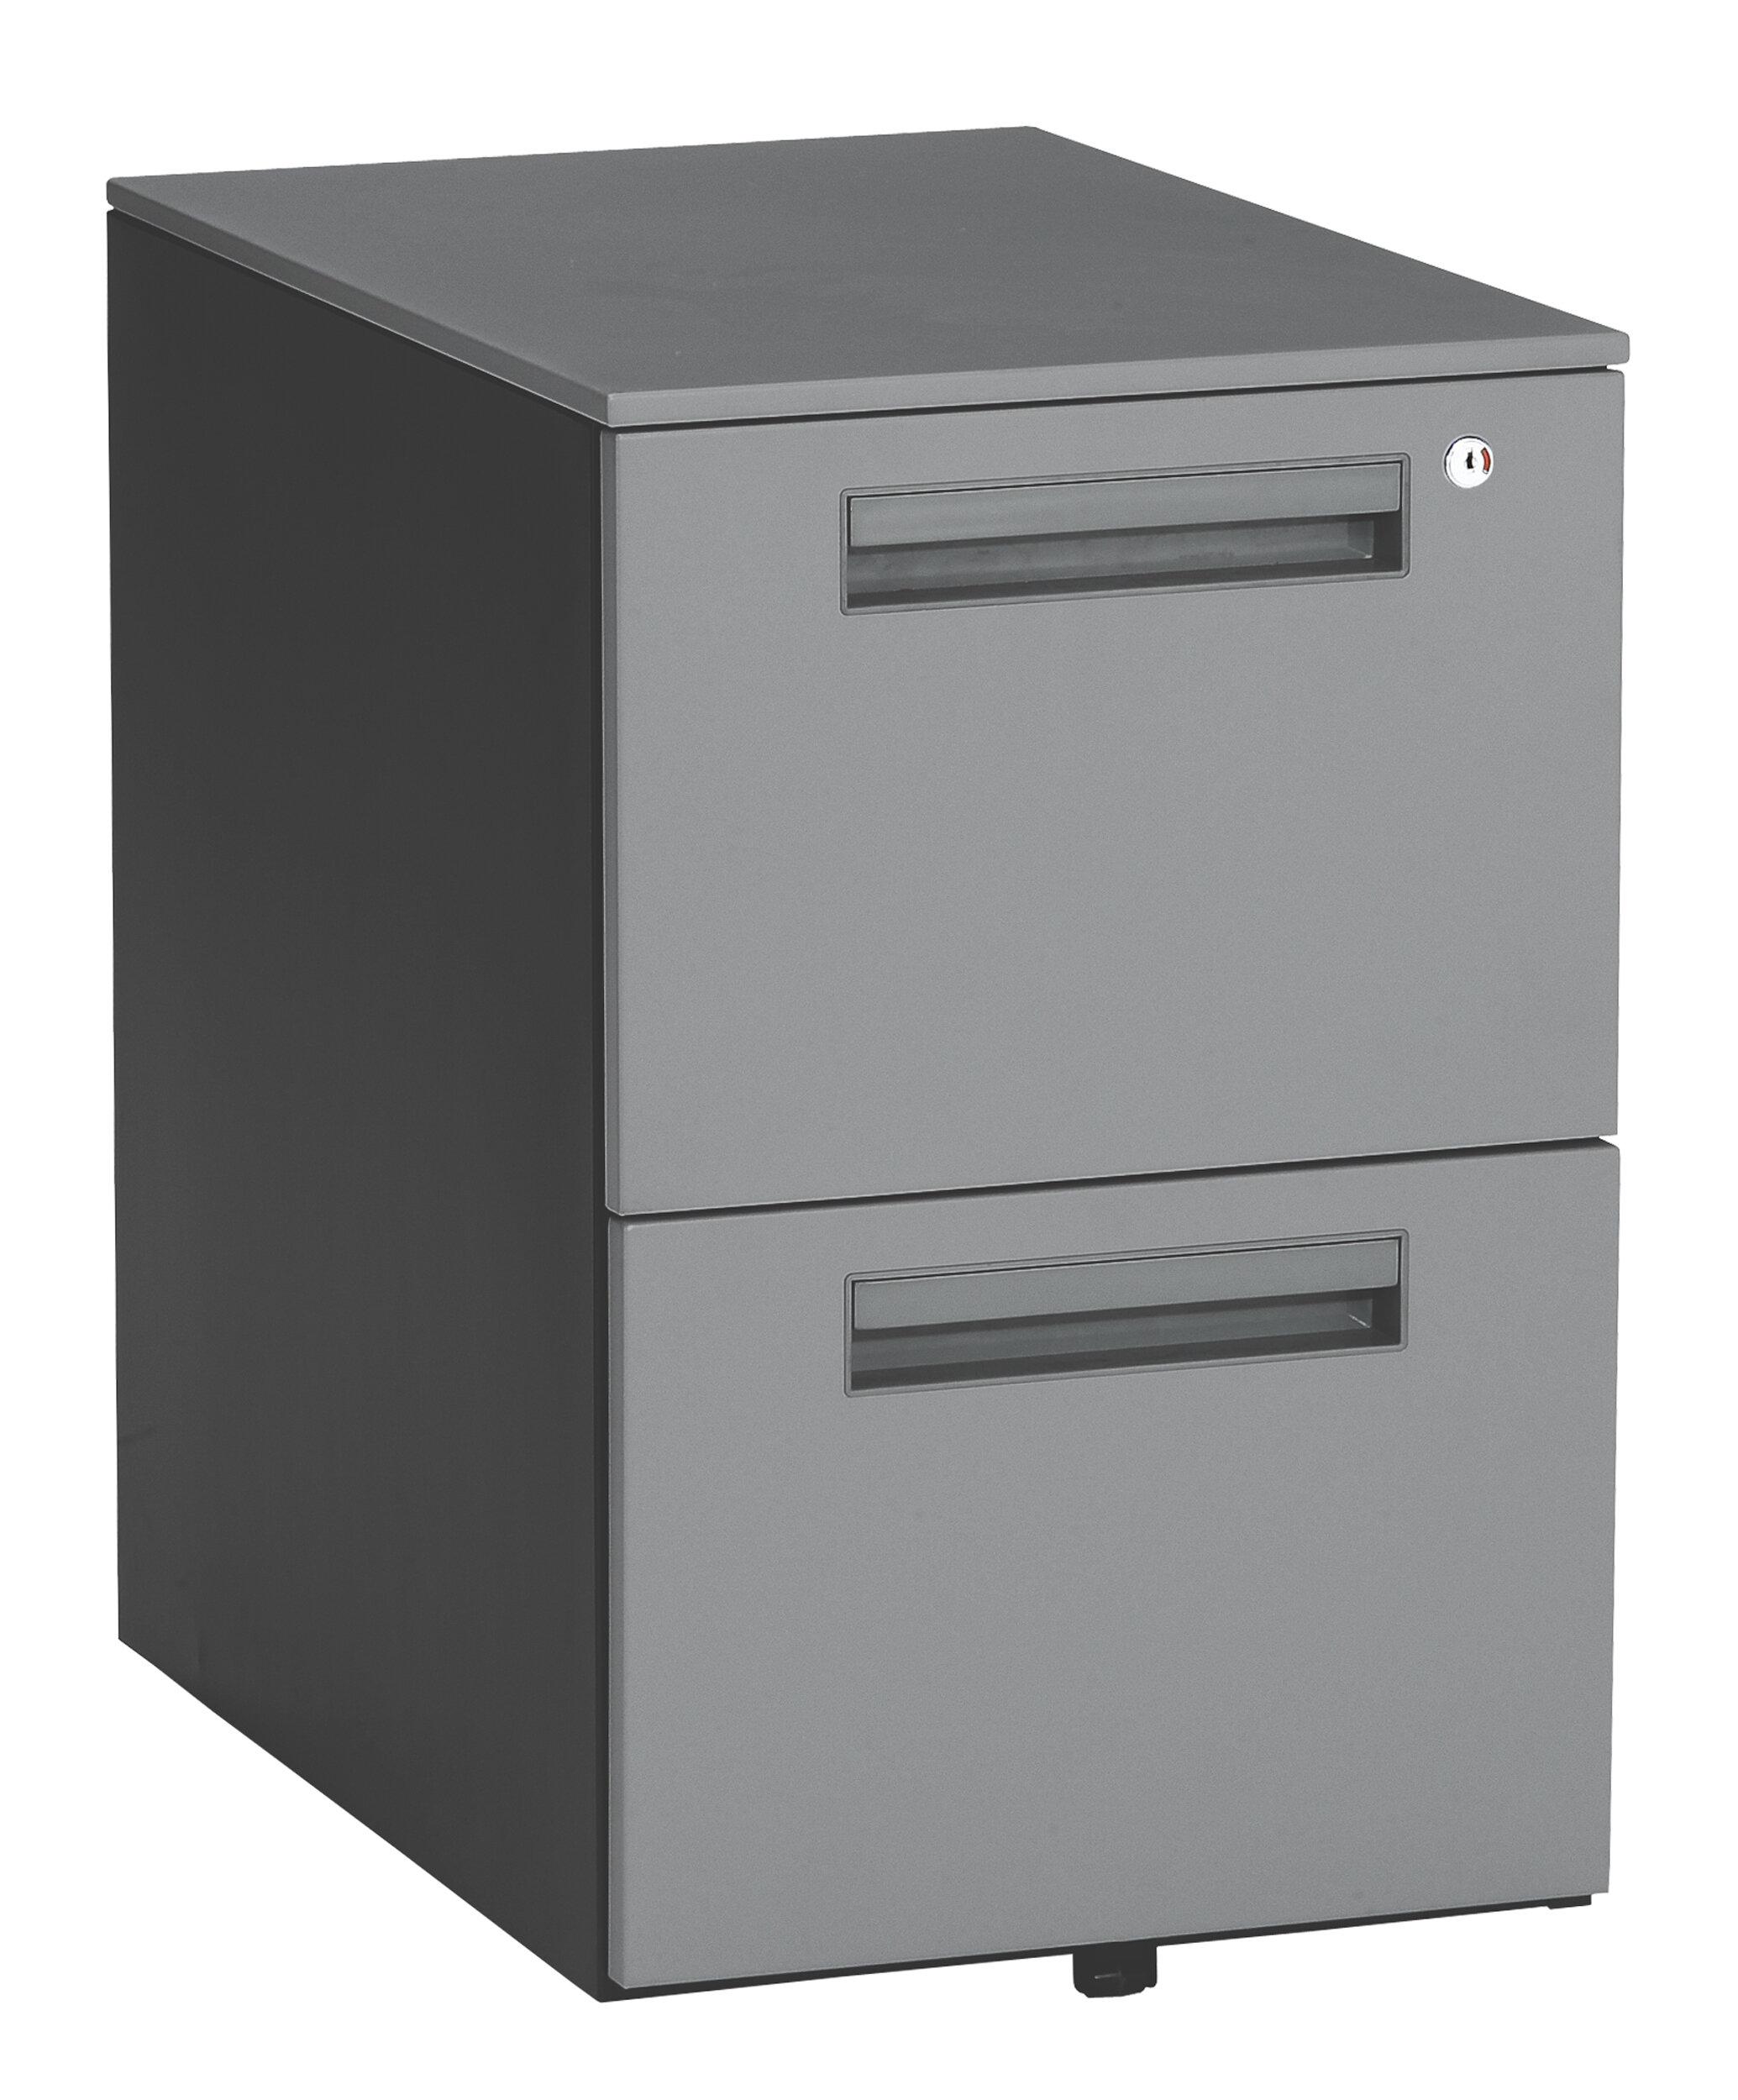 Ofm Executive Series 2 Drawer Mobile Vertical Filing Cabinet Reviews Wayfair